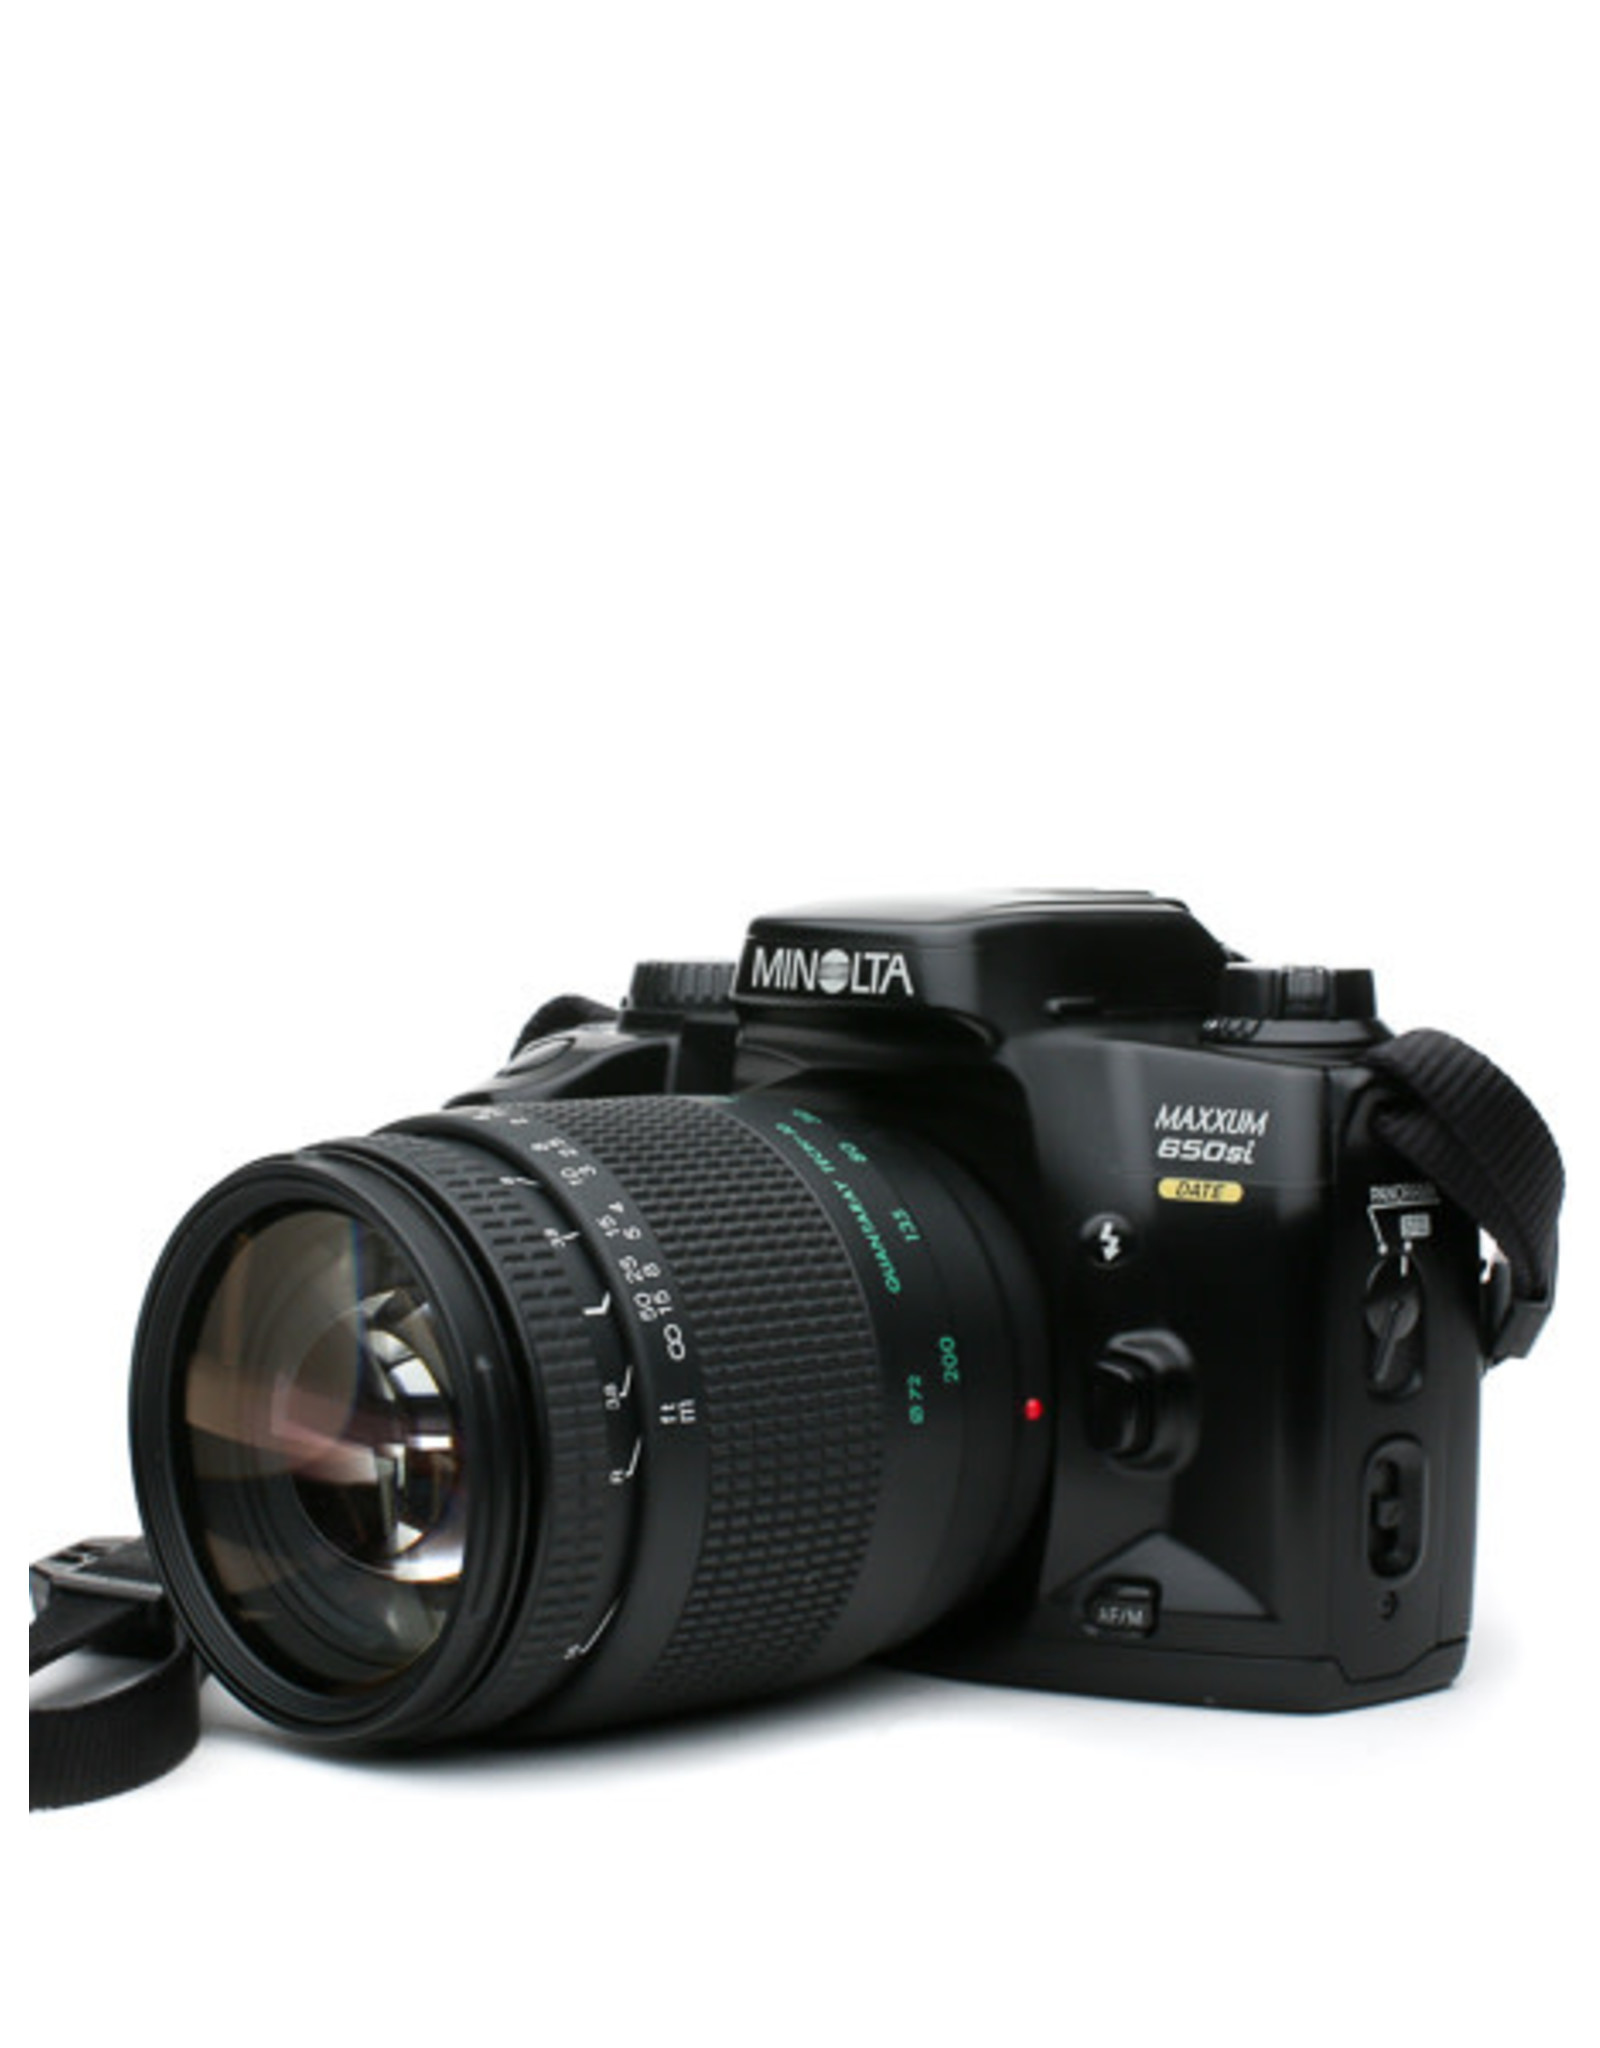 Minolta Minolta Maxxum 650si  35mm SLR Camera w/28-200 Lens